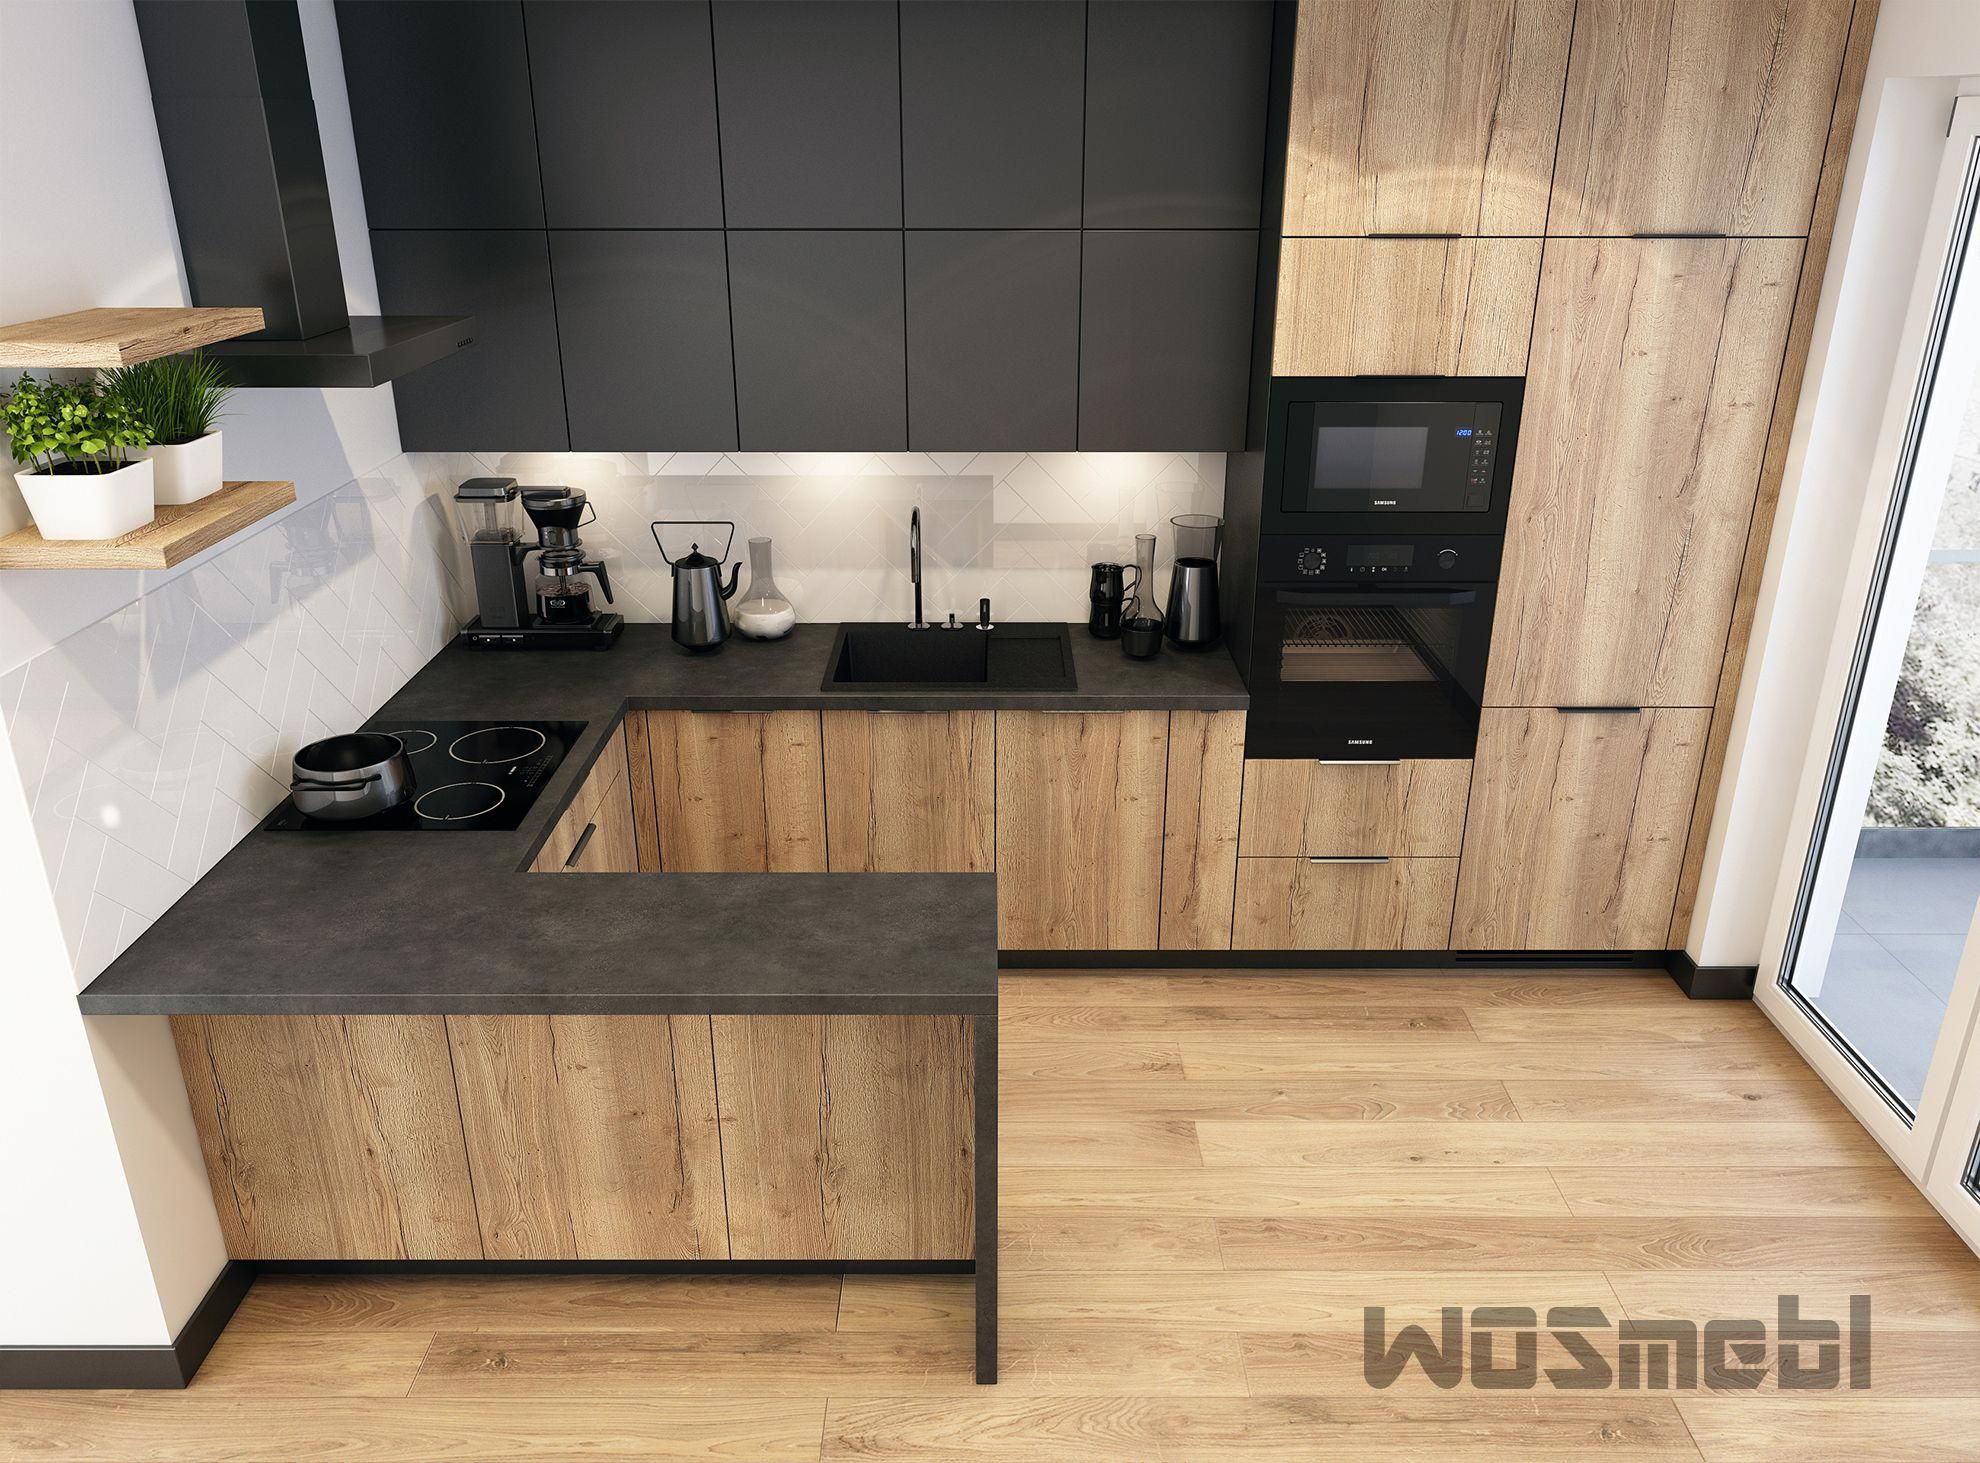 Realizacje Meble Kuchenne Na Wymiar Rzeszow Wosmebl Modernkitchen Kitchen Room Design Home Decor Kitchen Modern Kitchen Interiors